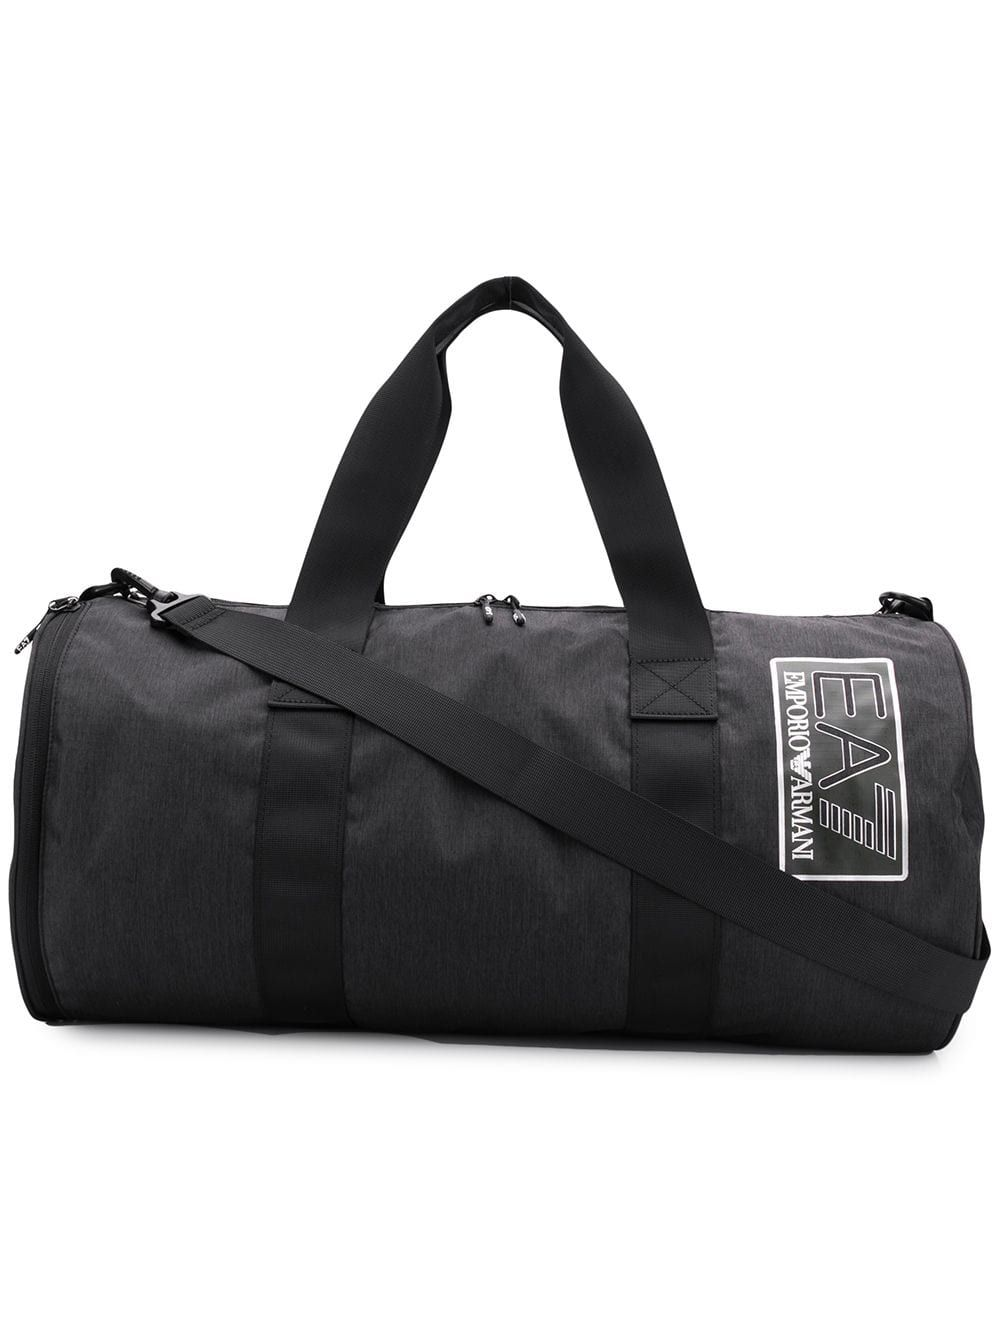 865eb38549bb EA7 EMPORIO ARMANI EA7 EMPORIO ARMANI LOGO PATCH HOLDALL - BLACK.   ea7emporioarmani  bags  polyester